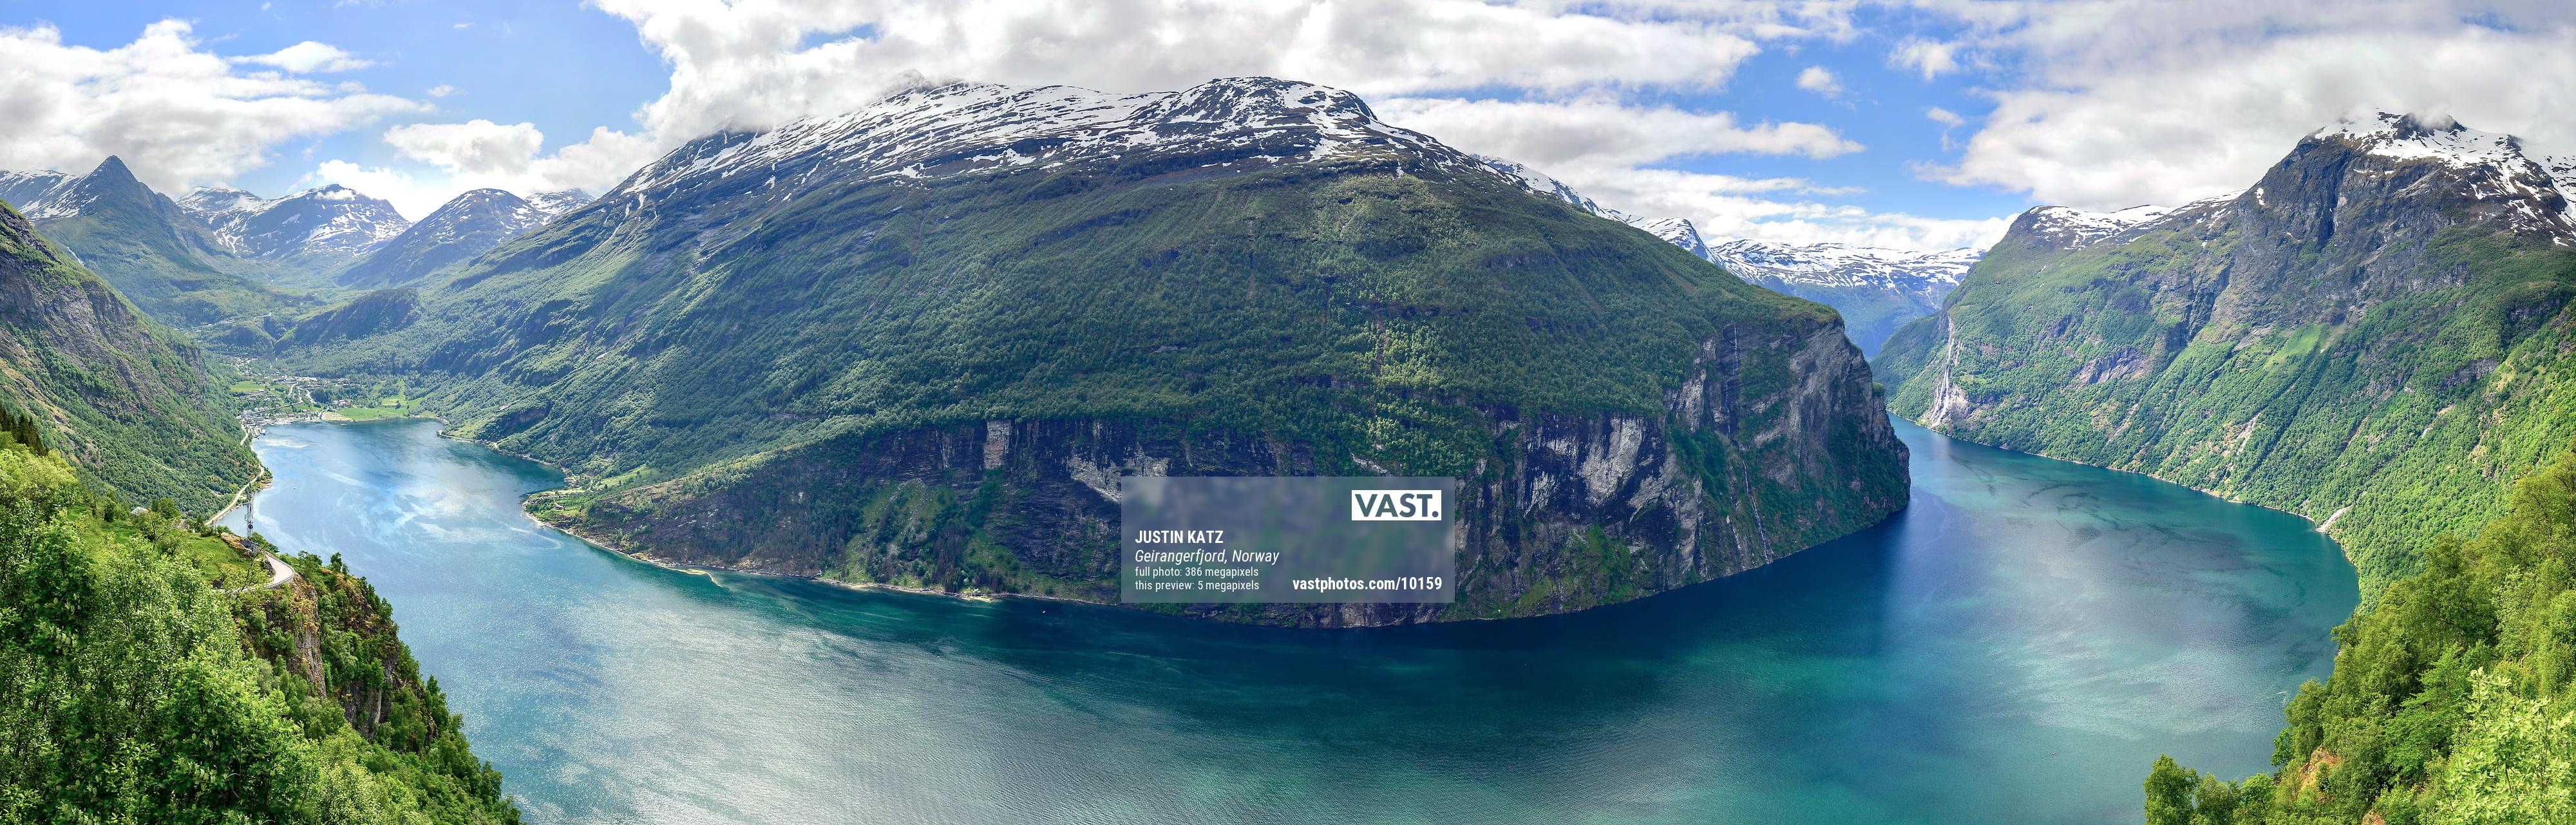 Lawson Fjord Single-Speed